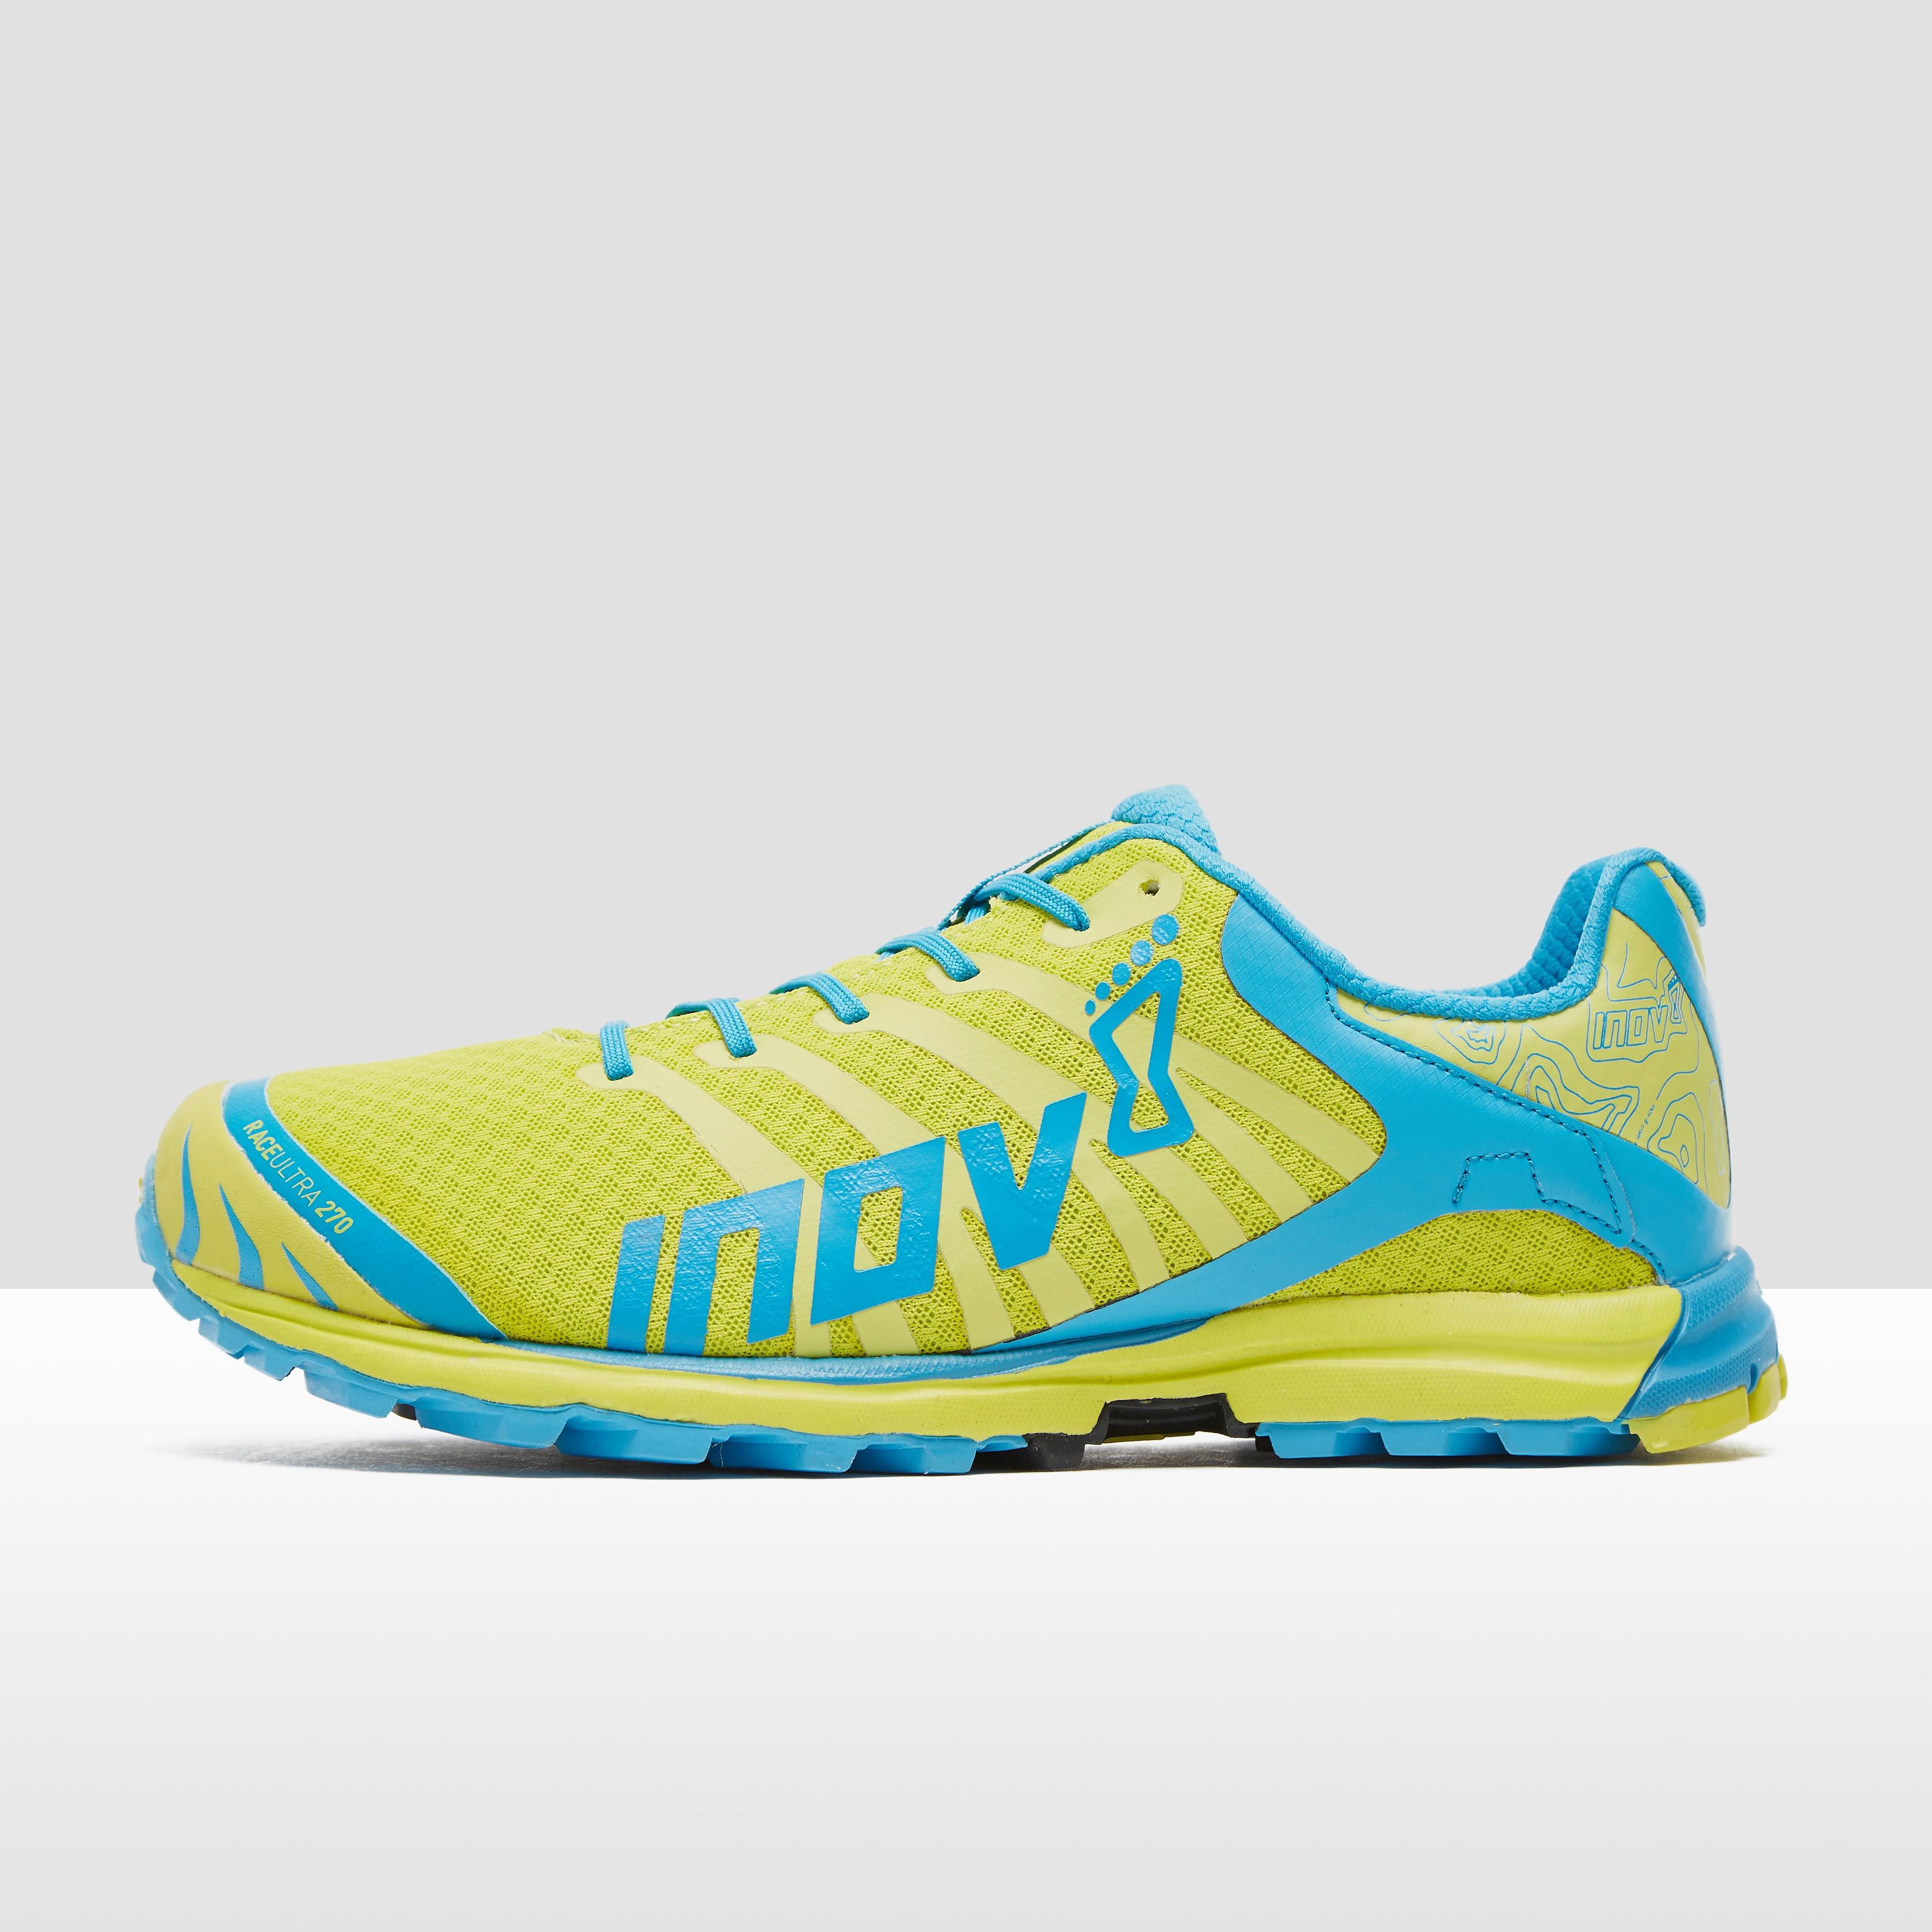 Inov-8 Race Ultra 270 Men's Trail Running Shoe